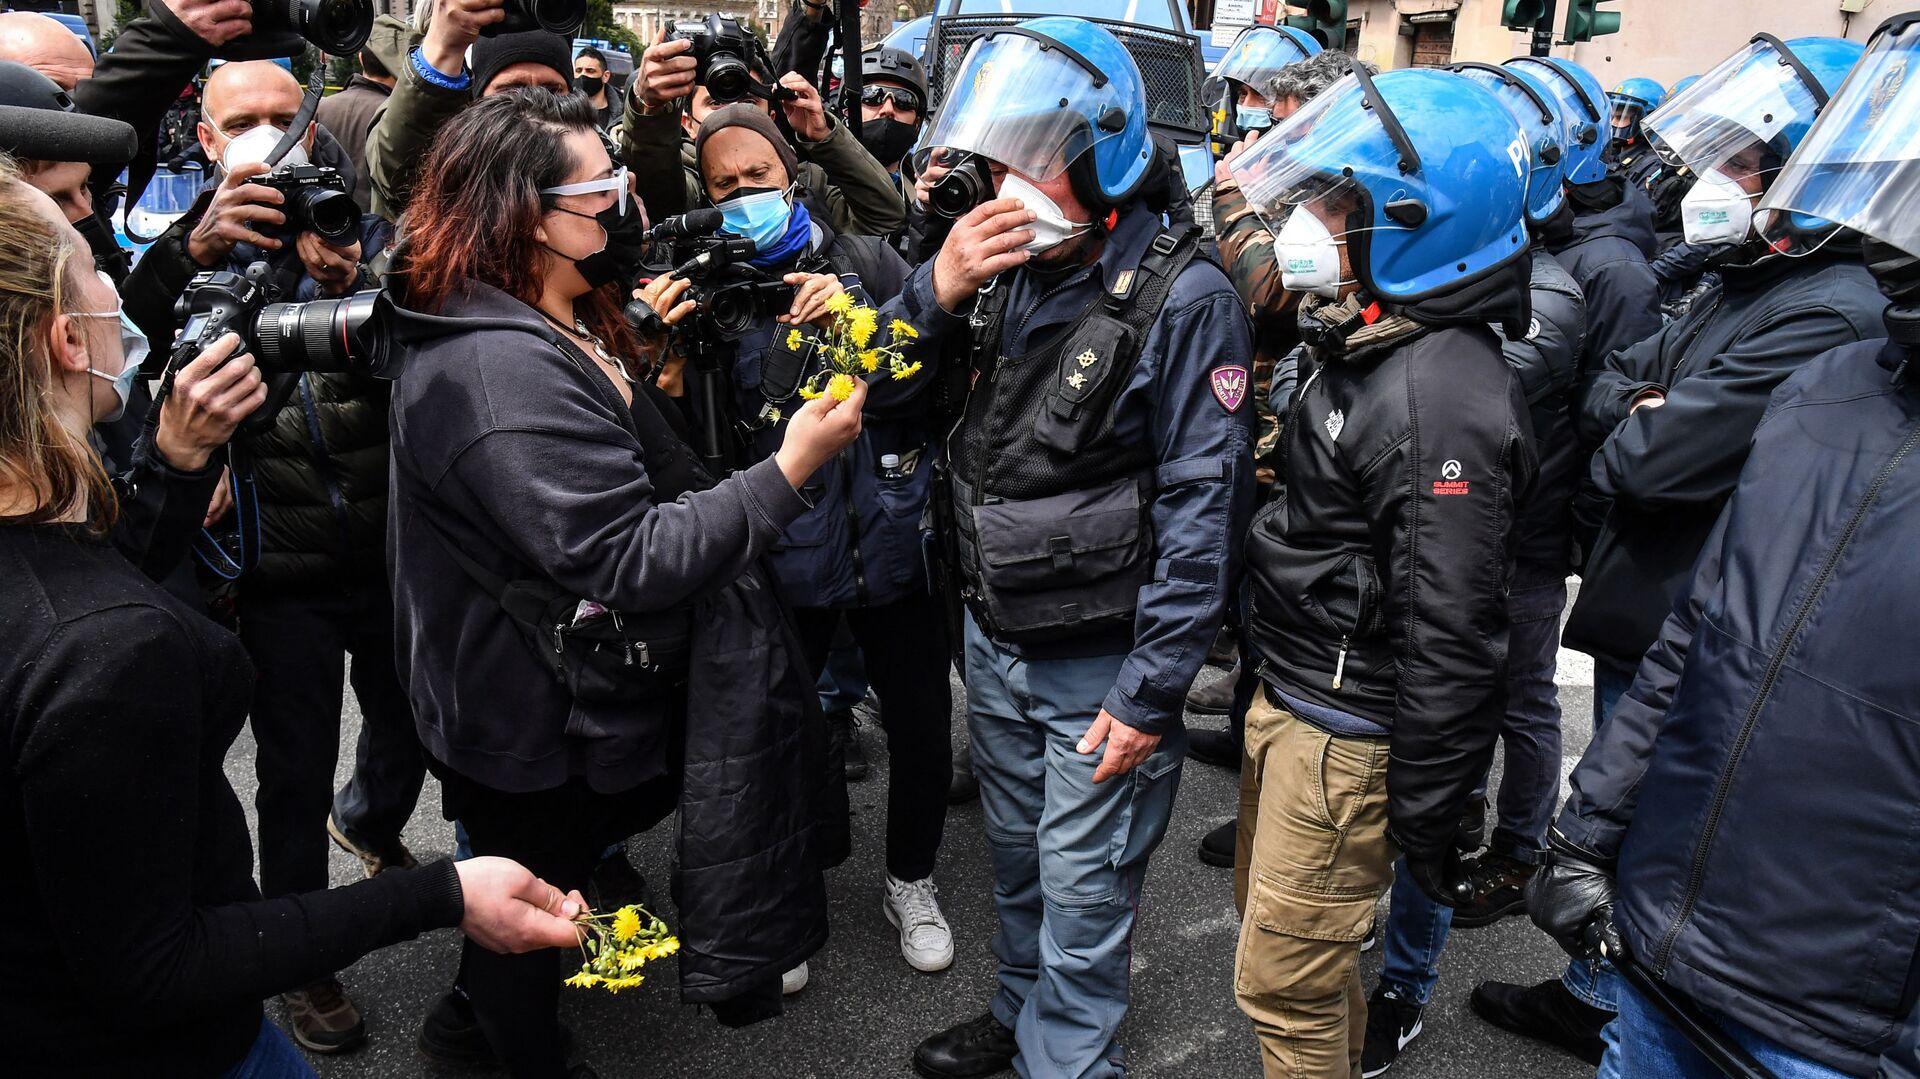 Proteste dei ristoratori a Roma, 13 aprile 2021 - Sputnik Italia, 1920, 13.04.2021